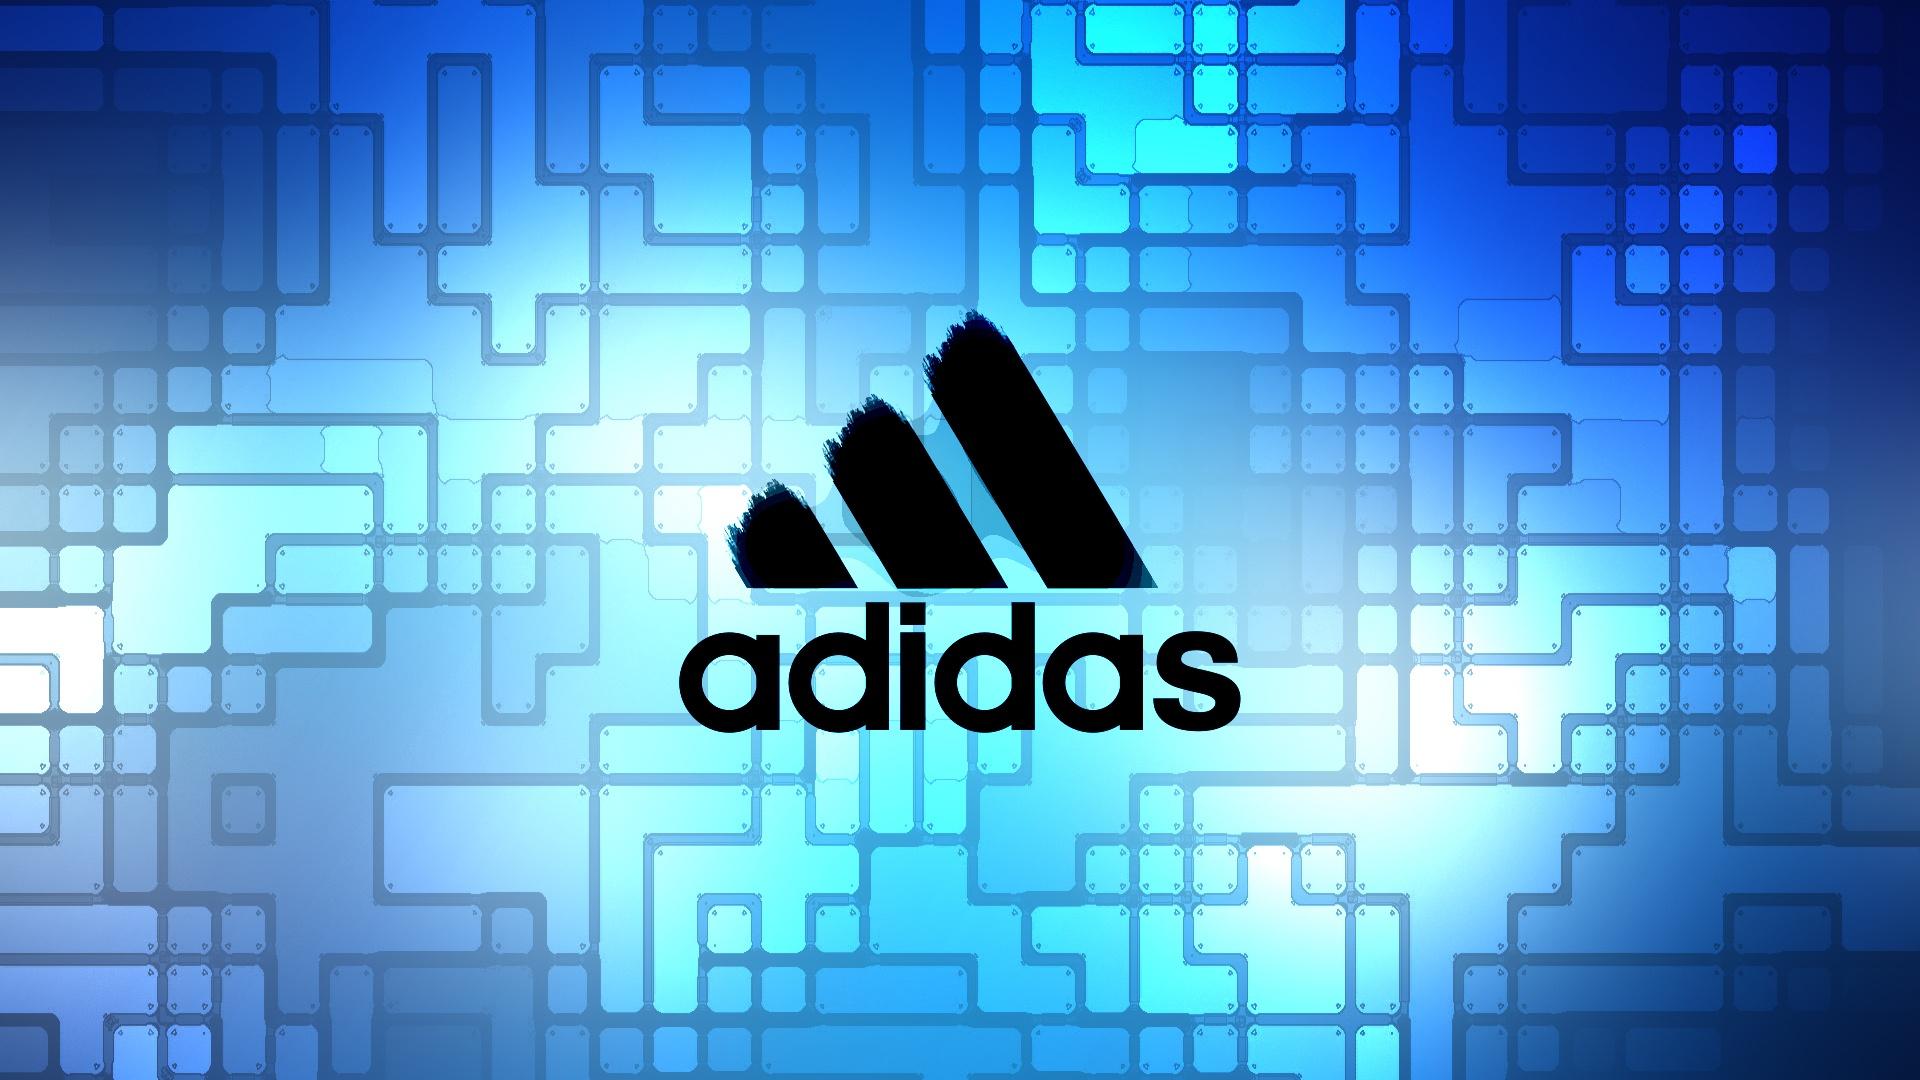 wallpaper adidas hd